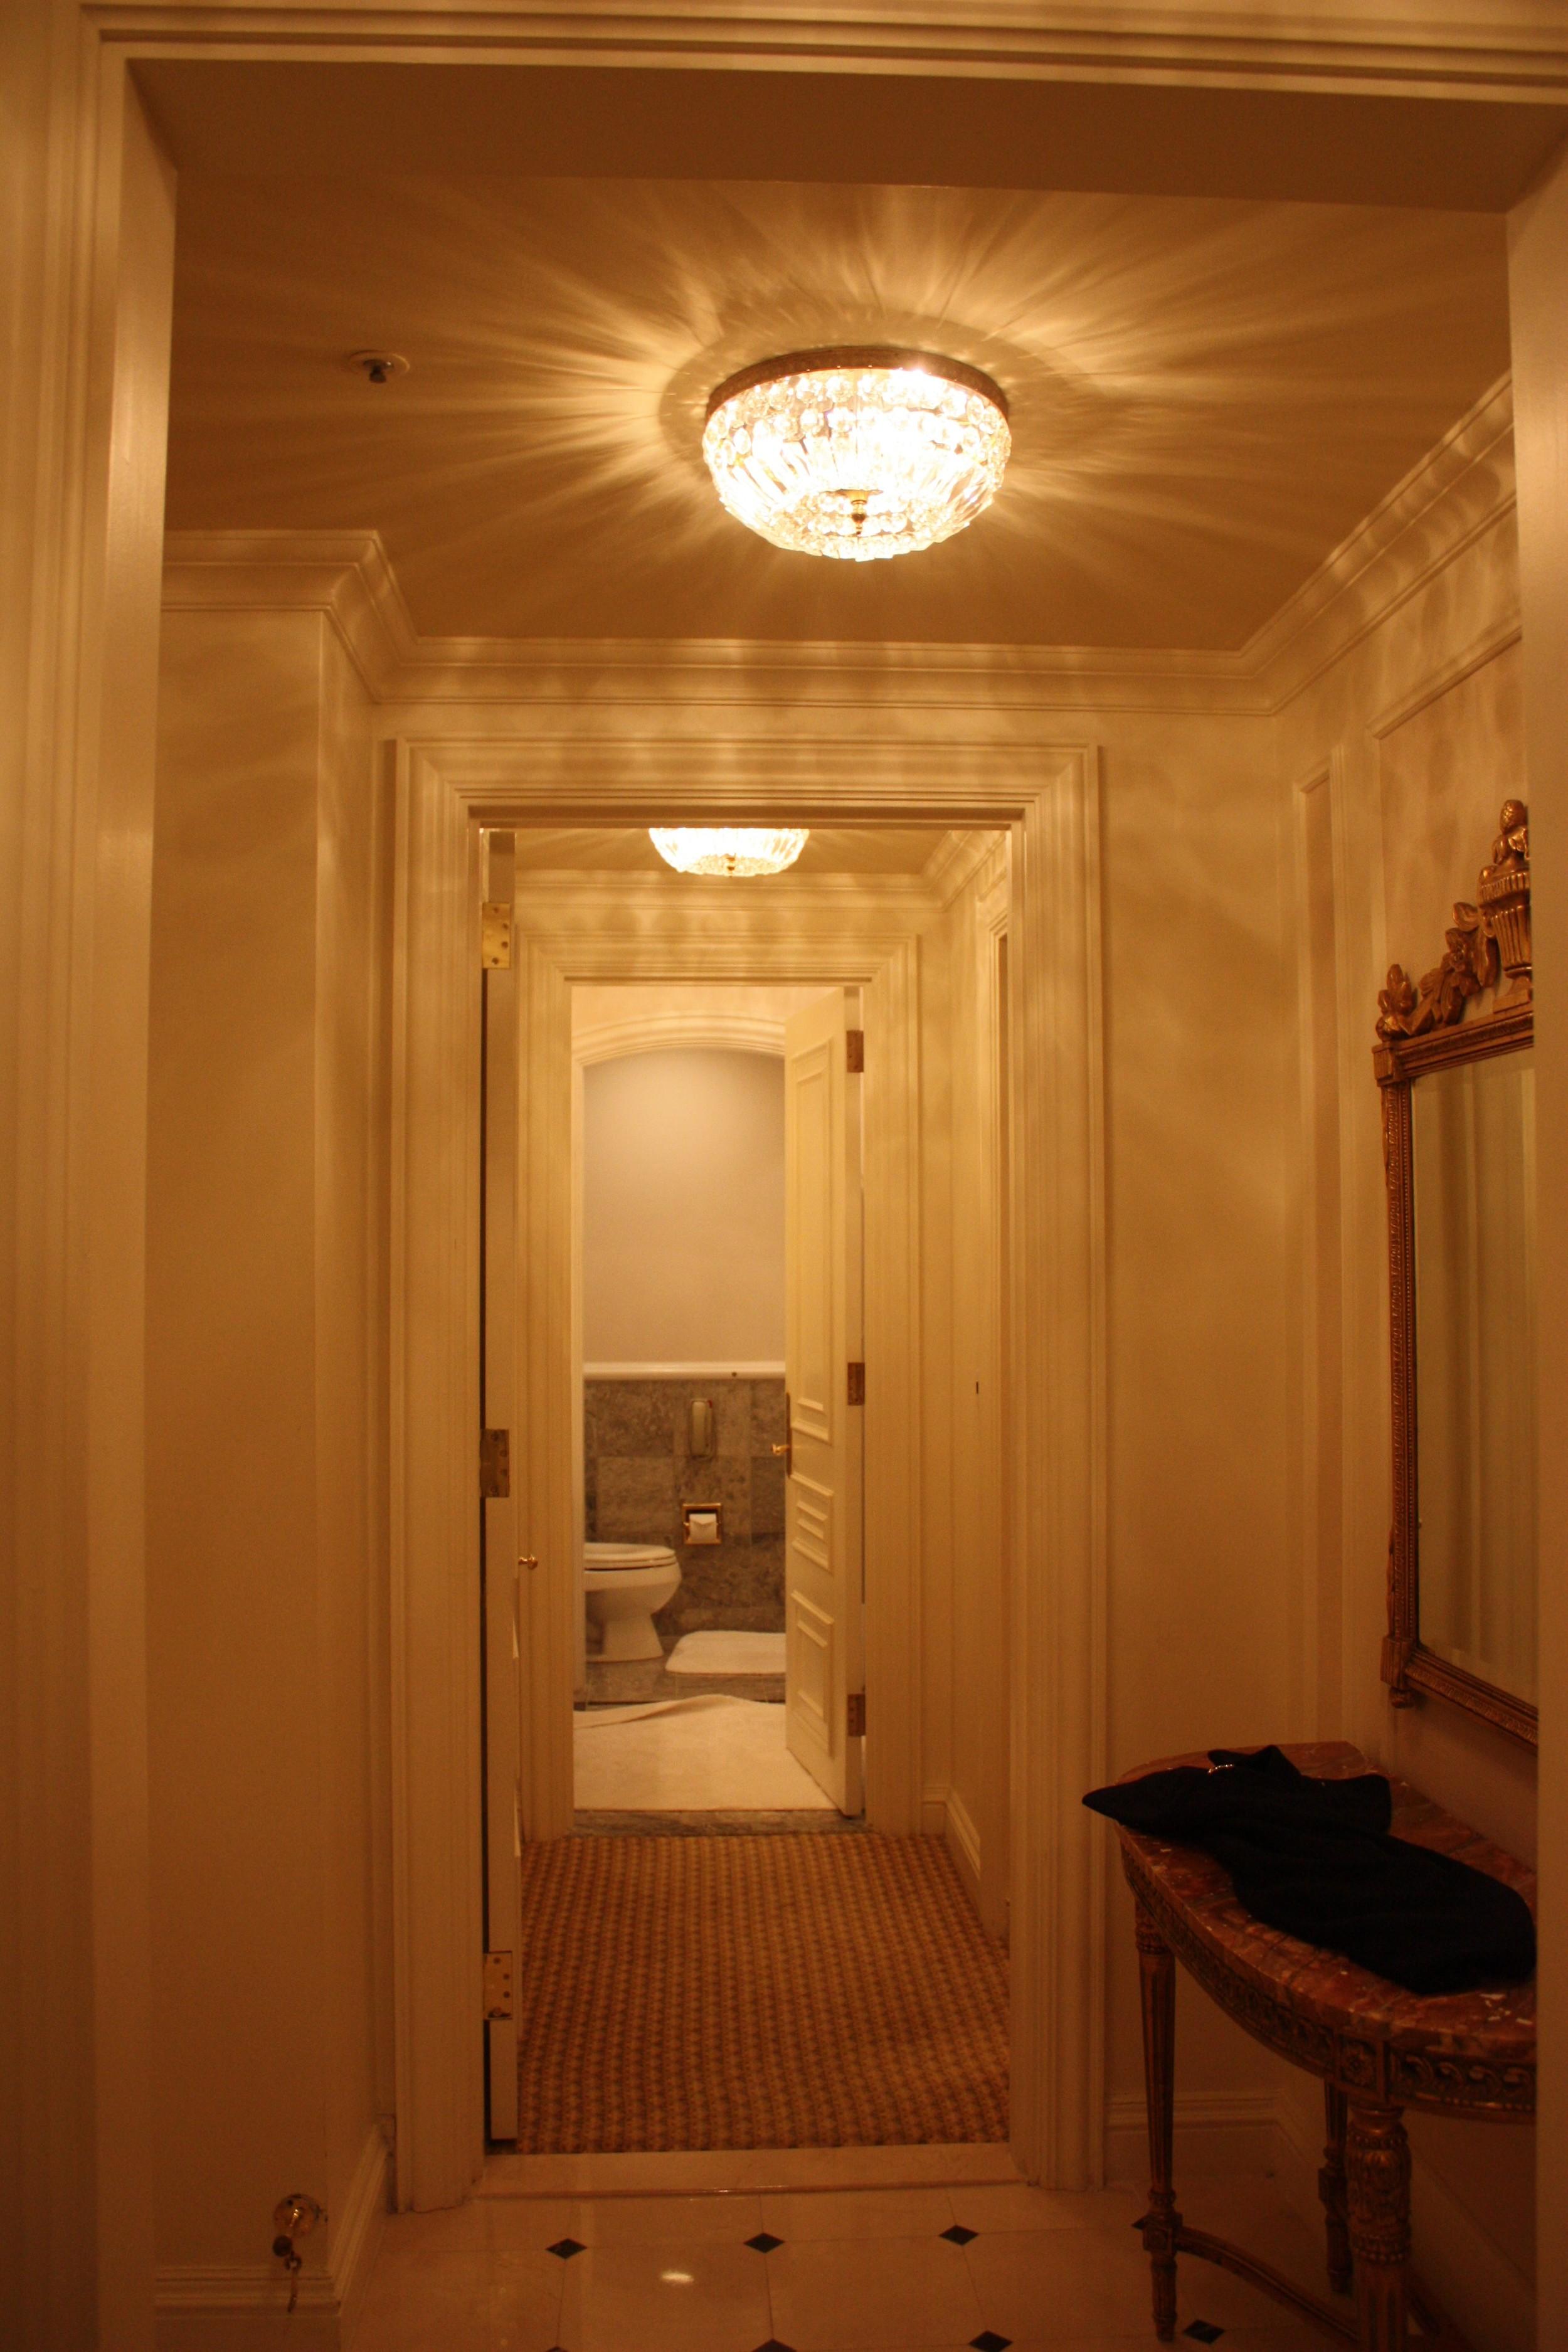 St Regis Hallway NYC